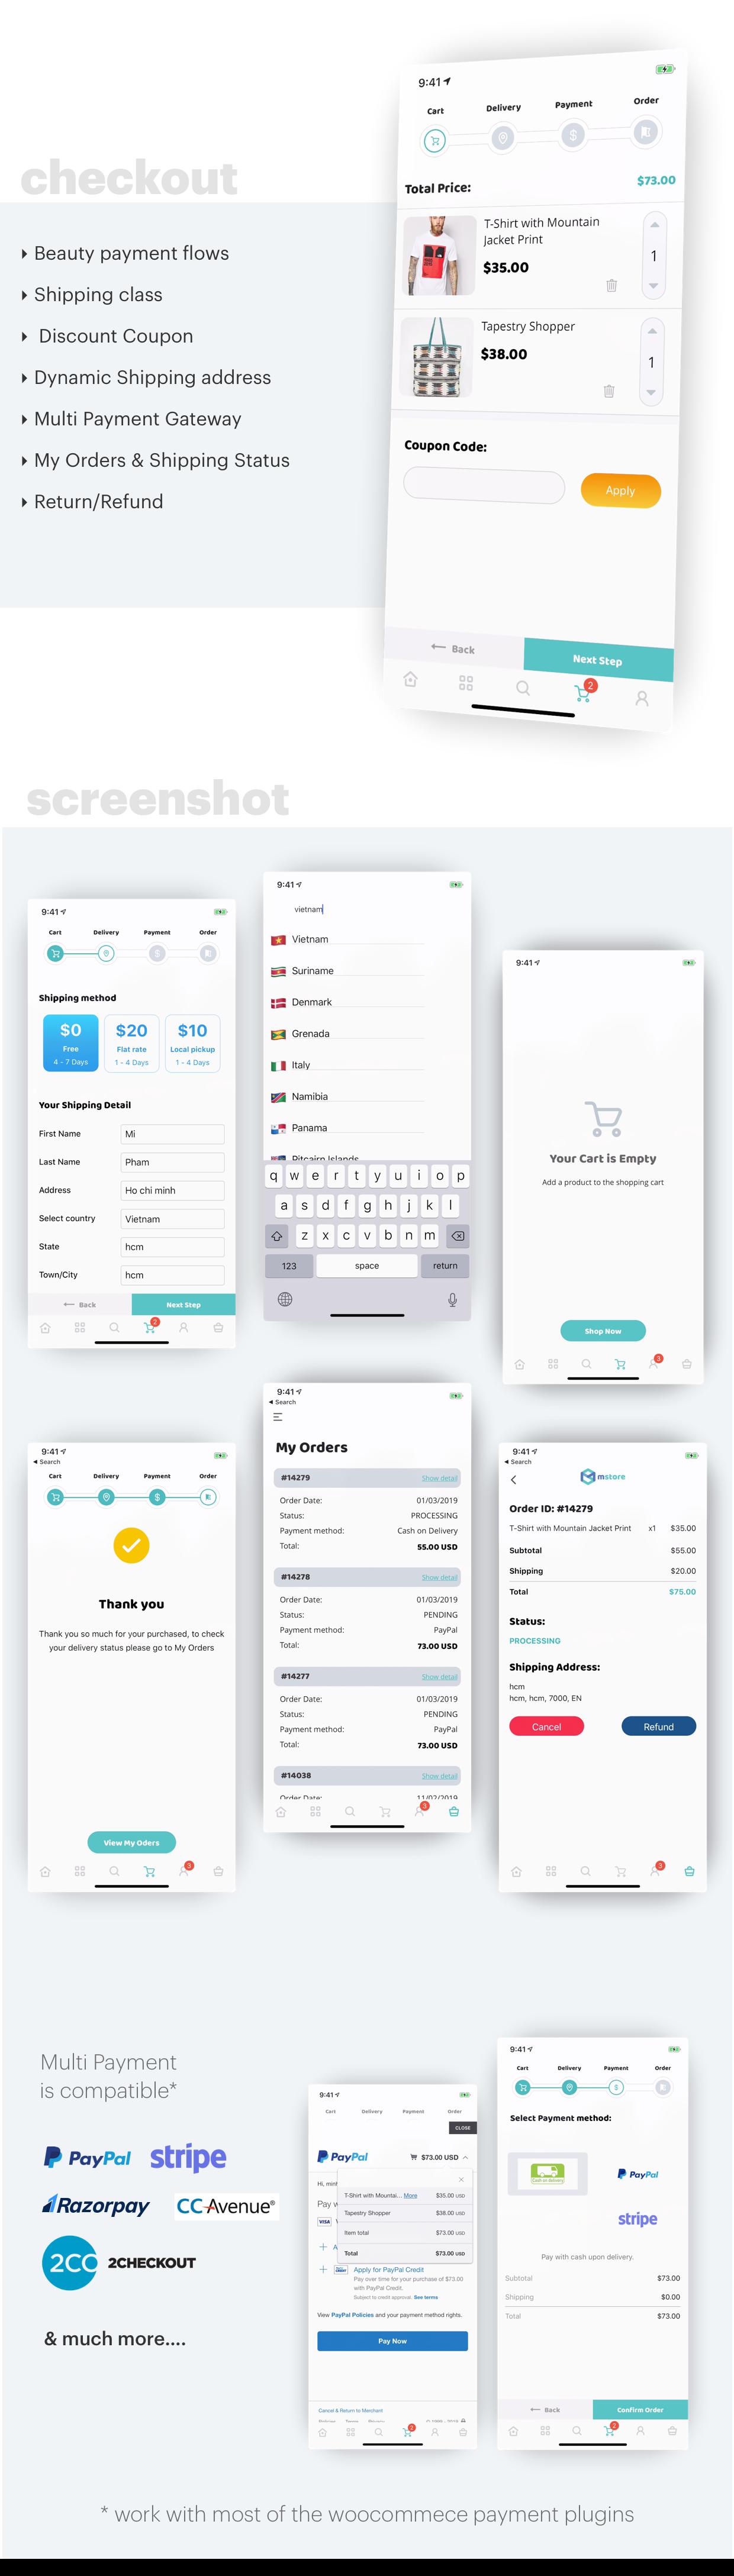 MStore Pro - Templat Lengkap React Native untuk e-commerce - 18